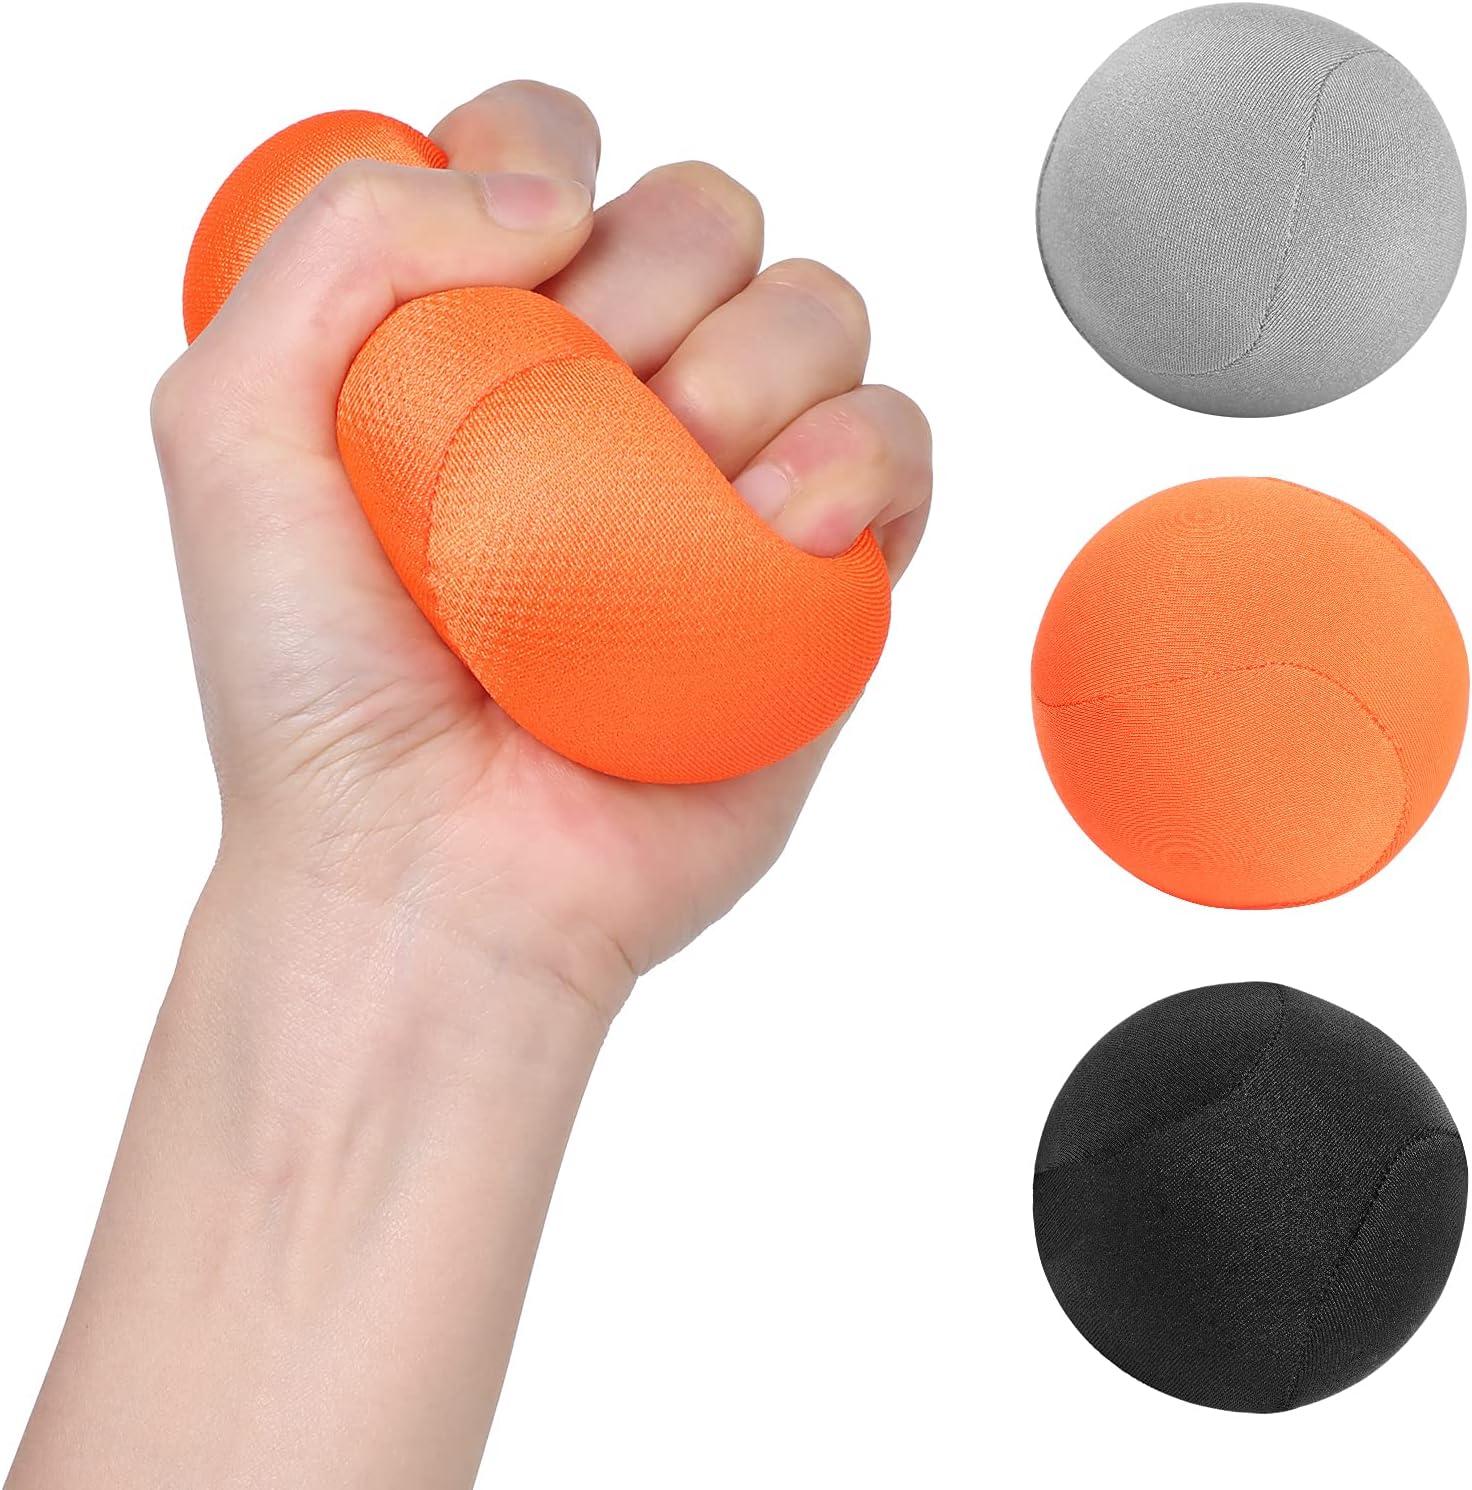 WDCD Hand Balls Discount is also underway 3 Pcs Grip Traine Gel Price reduction Strength